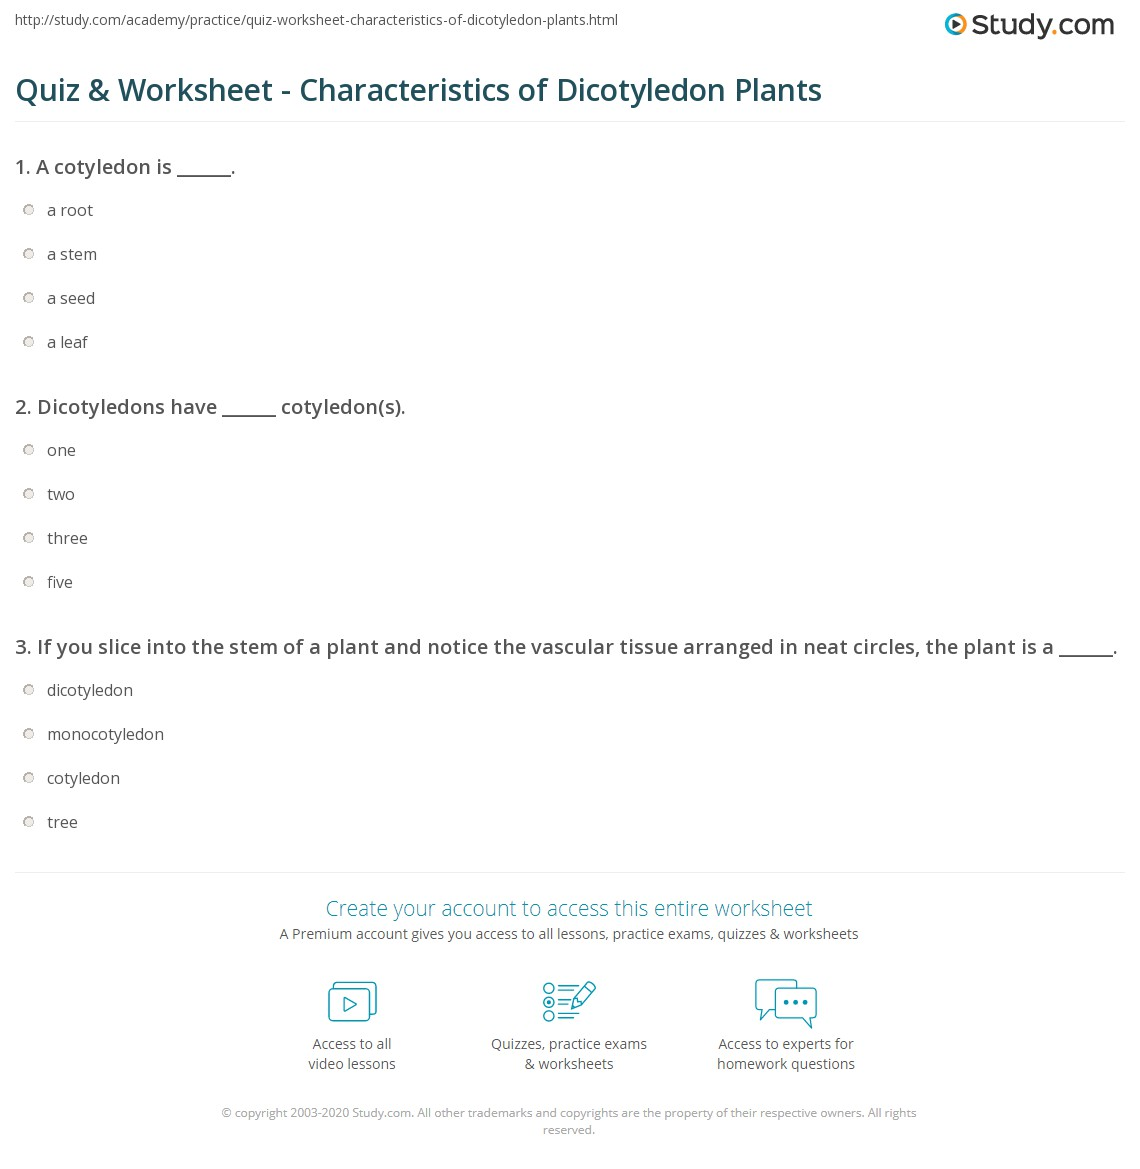 Quiz & Worksheet - Characteristics of Dicotyledon Plants